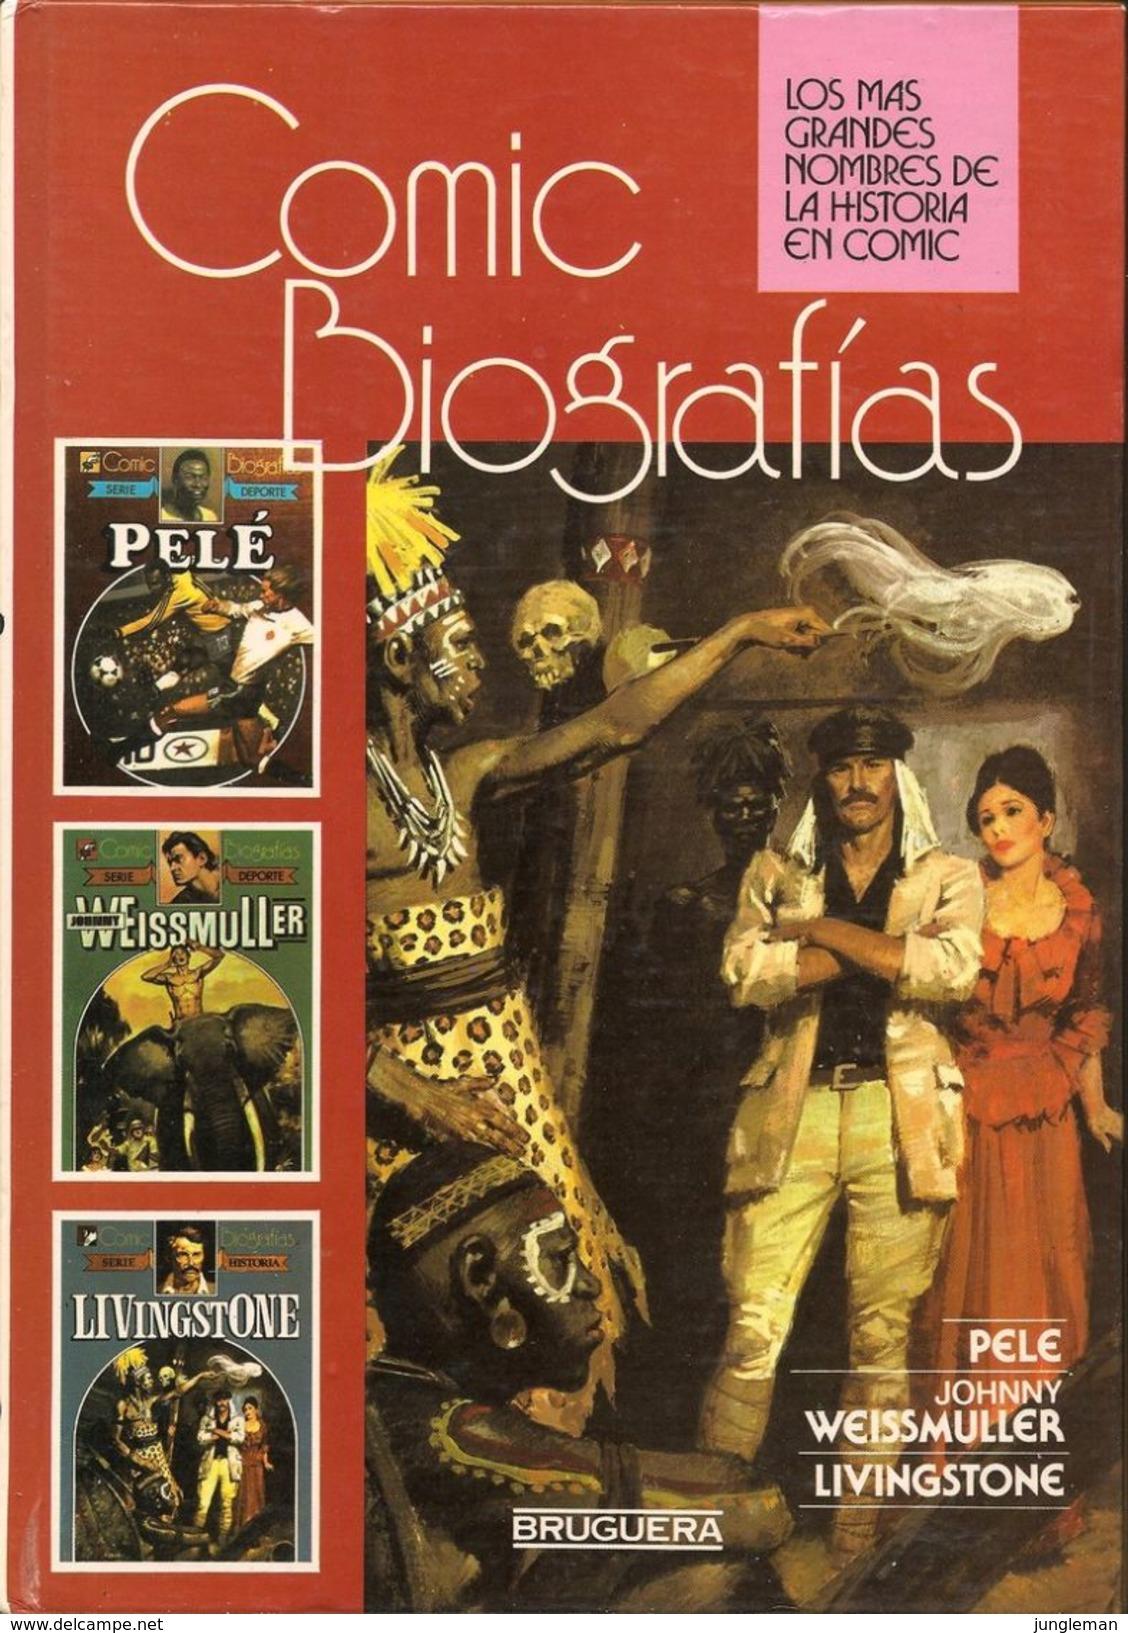 Comic Biografias  - Editions Bruguera - La Biografía De Pelé, Johnny Weissmuller Et Livingstone - En Espagnol - Neuf. - Livres, BD, Revues